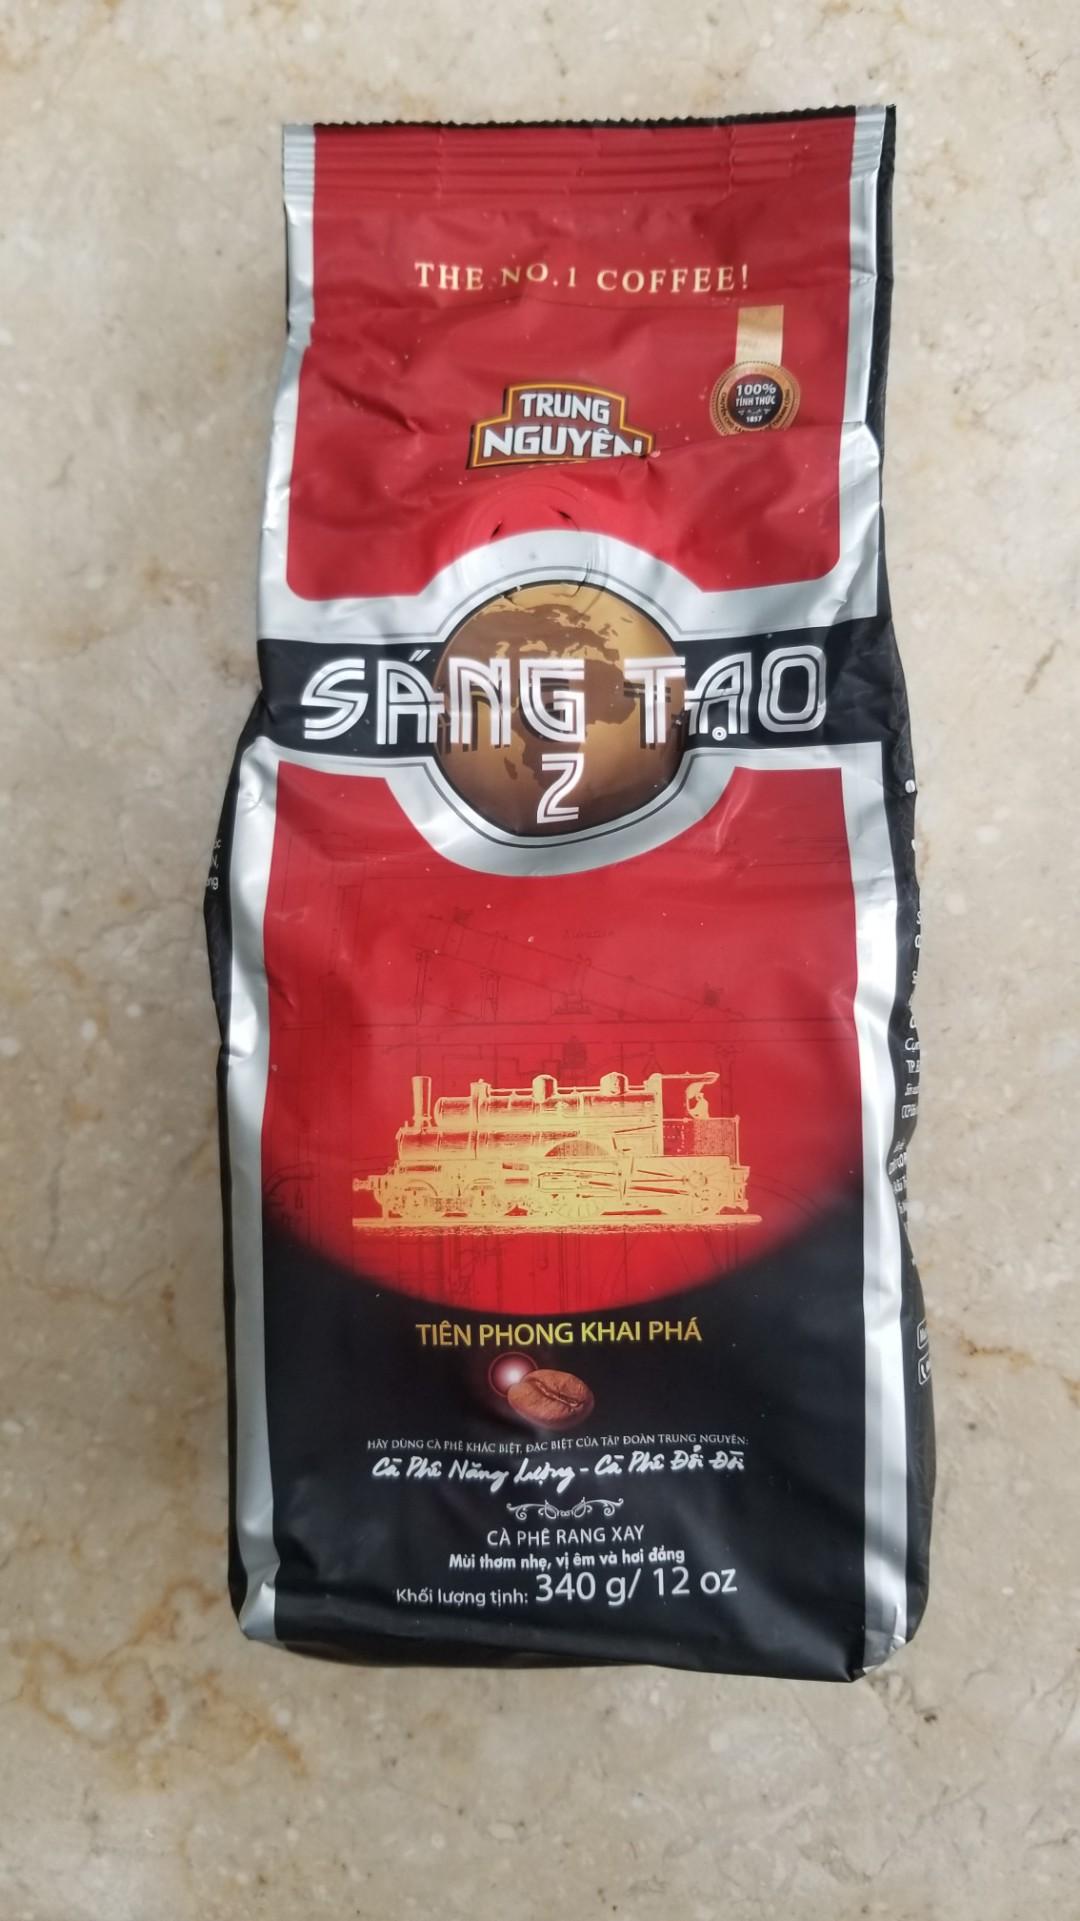 Creative 2 (Sang Tao) 340g TRUNG NGUYEN ground Coffee